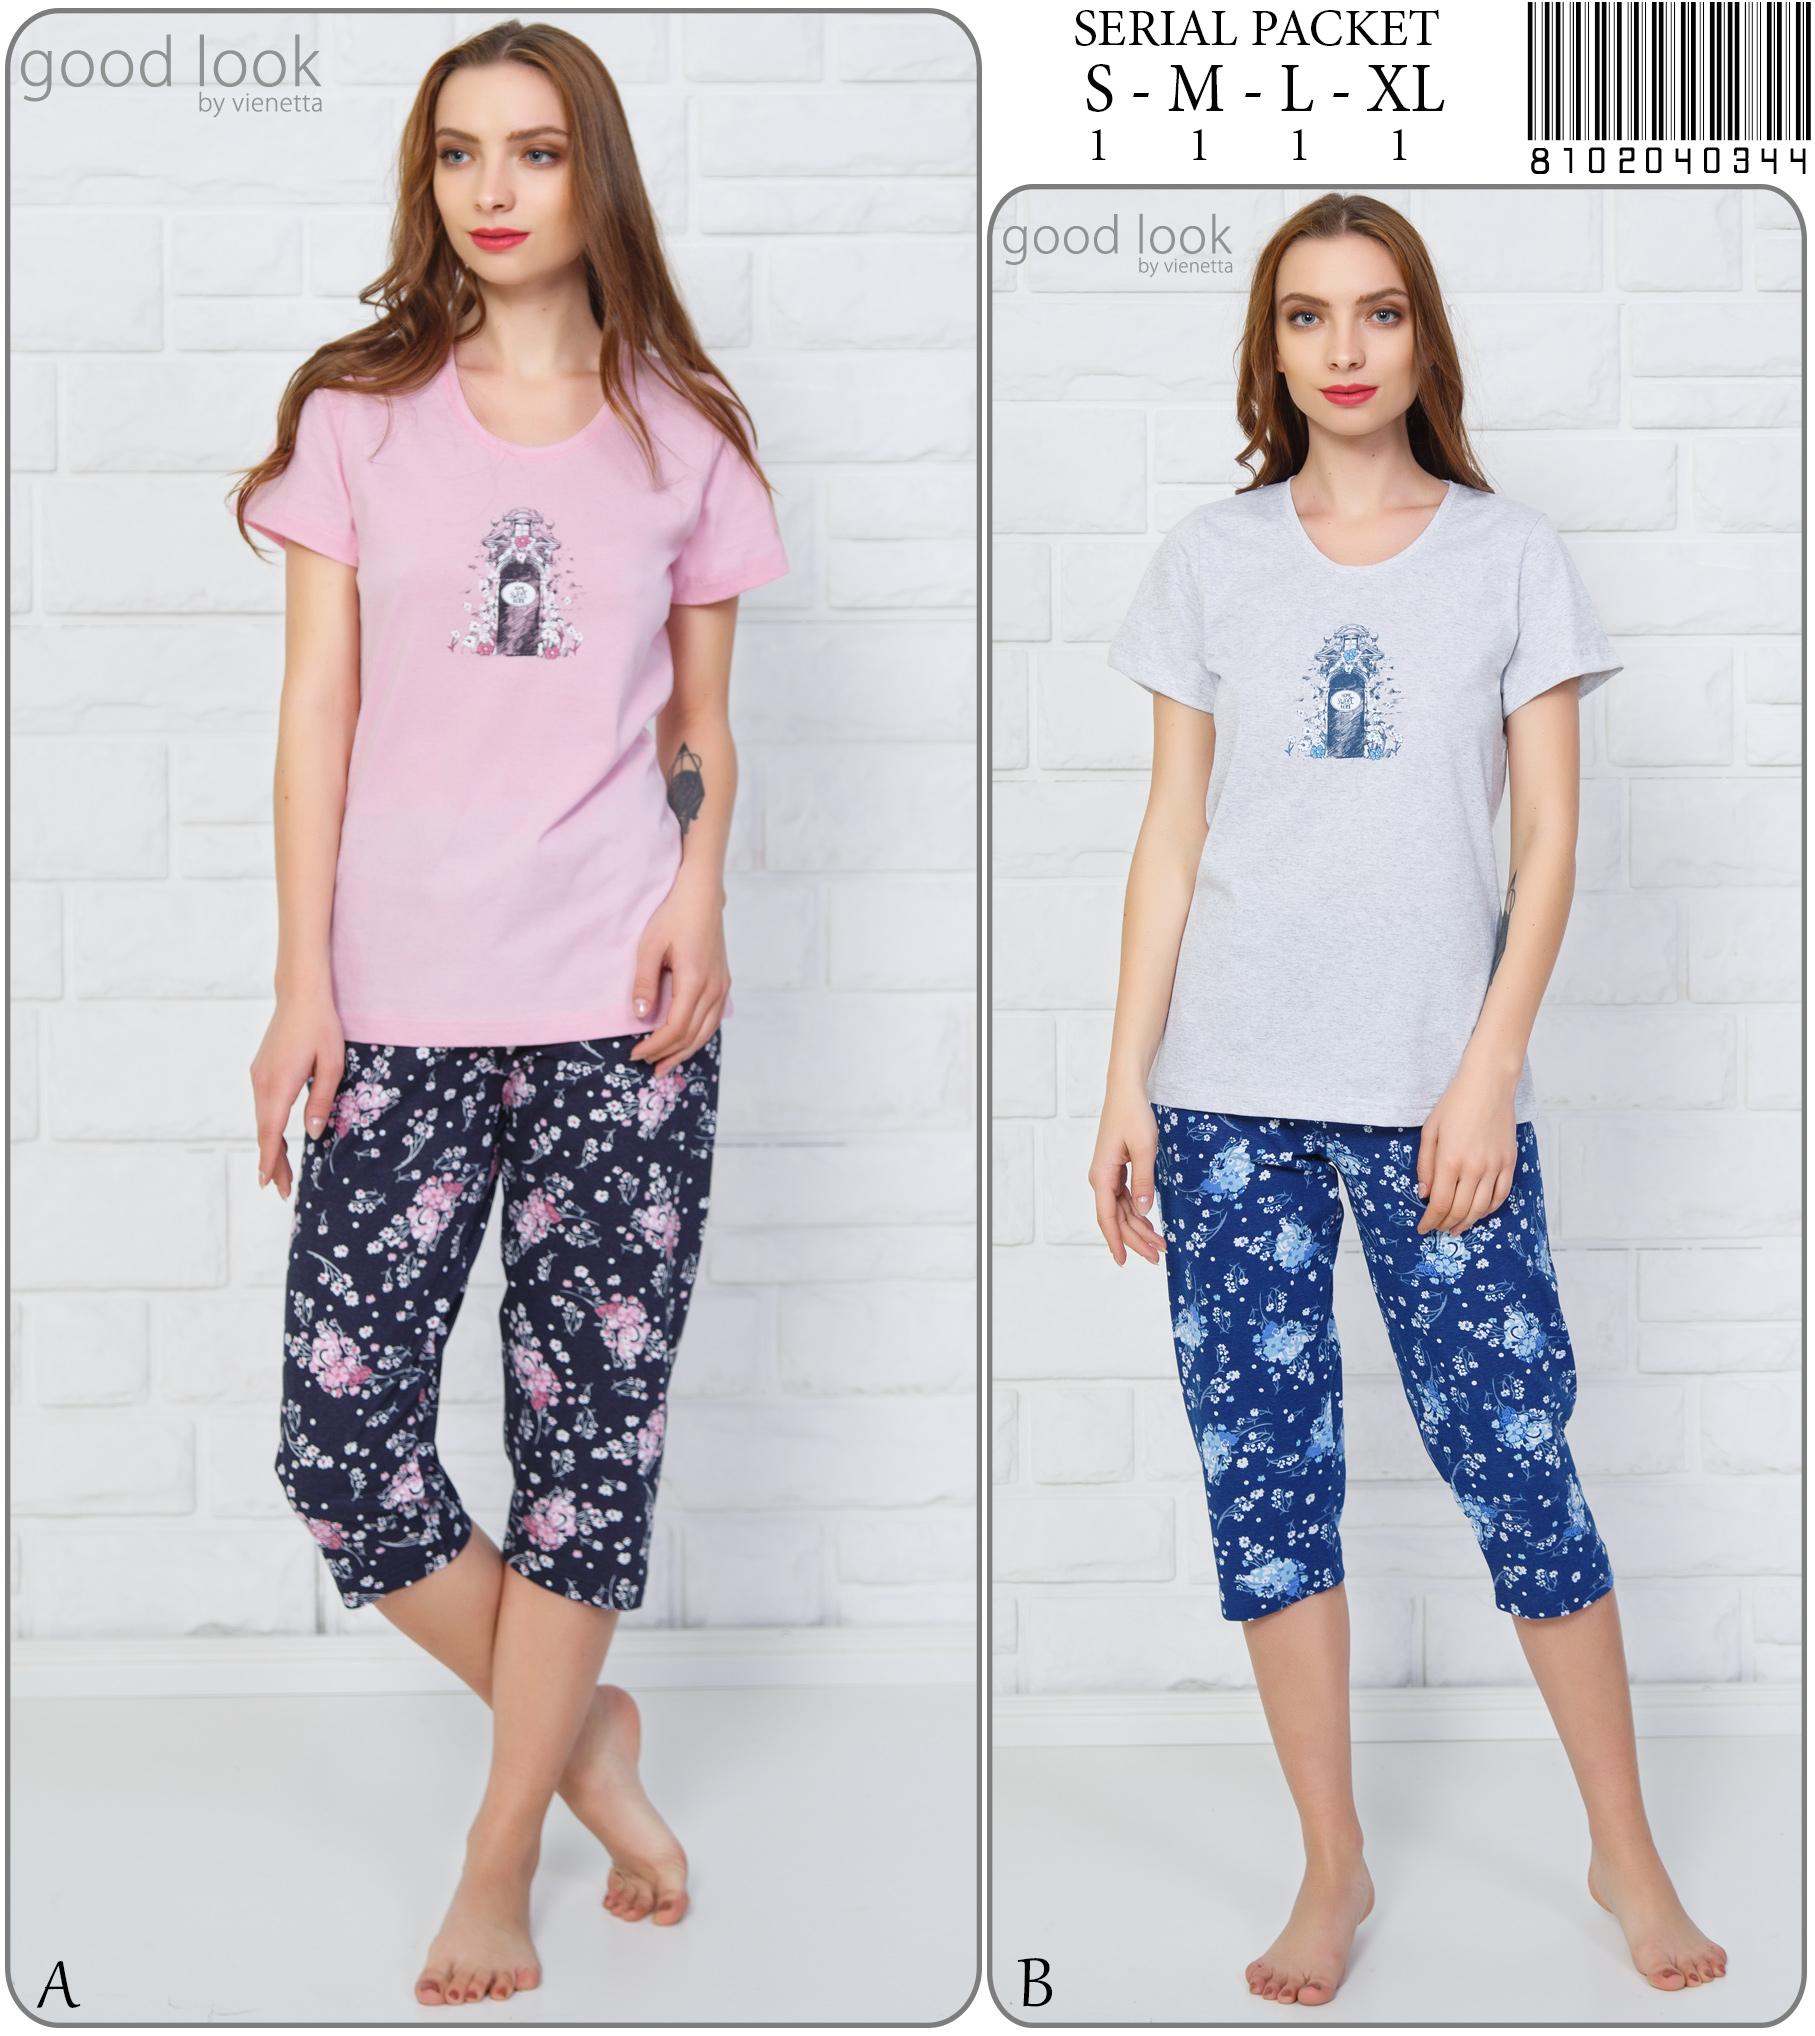 Пижама женская Капри 8102040344